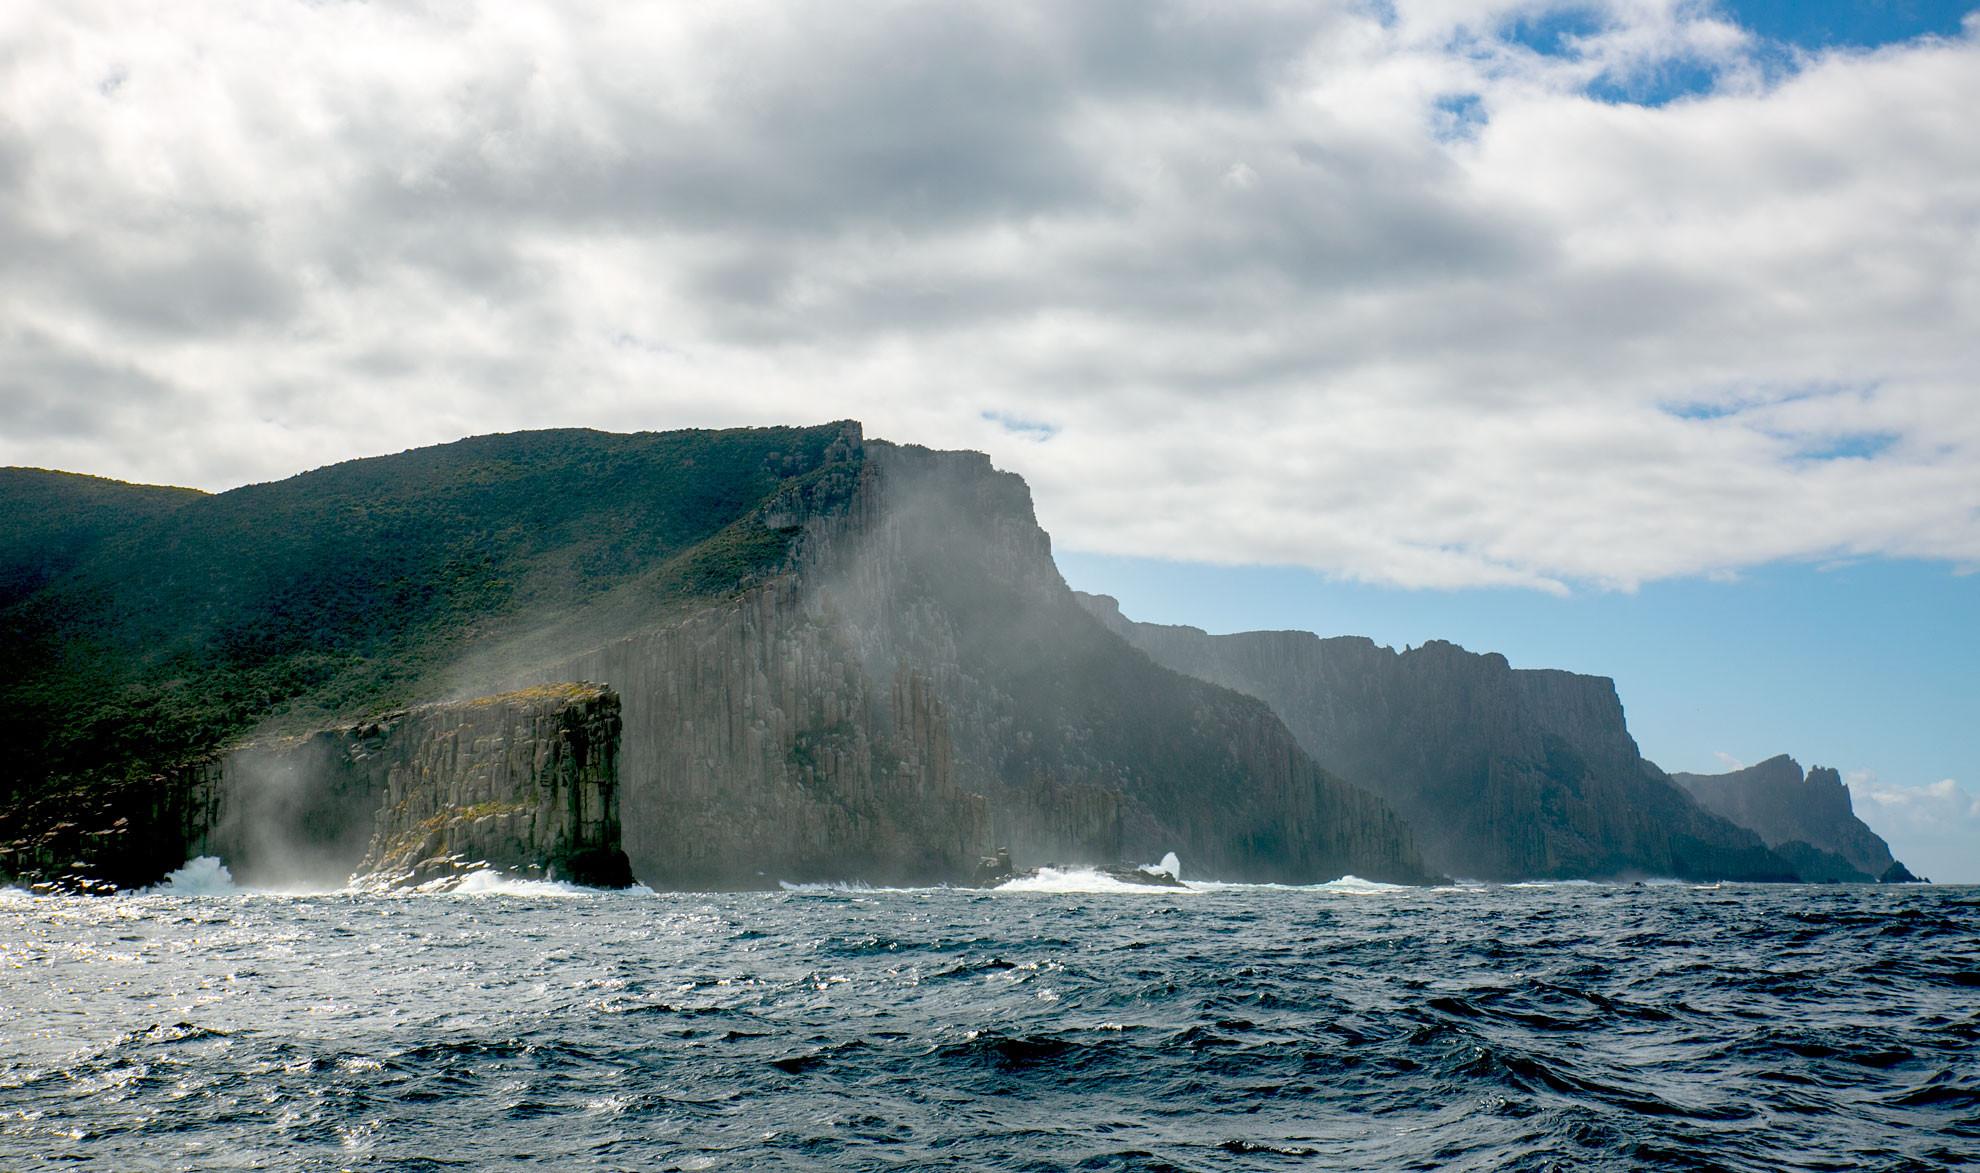 Tasma-souther-coast-cliffs.jpg